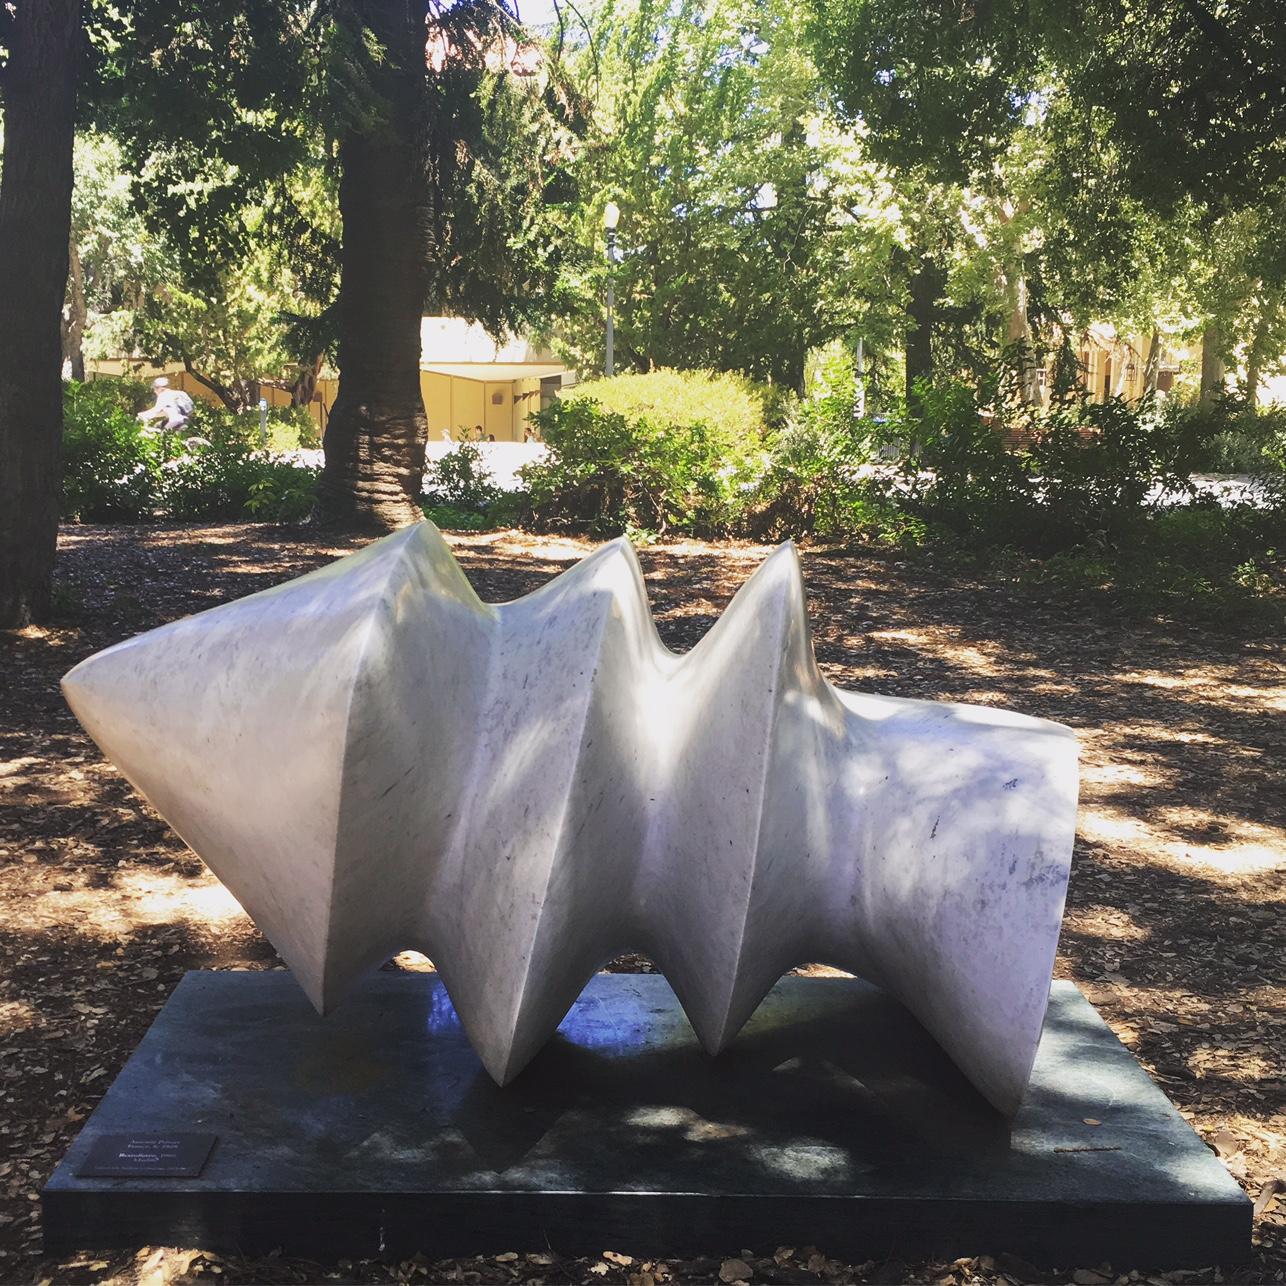 Antoine Poncet, Retrofutée, 1969 , marble, Stanford University Campus. Photo Credit: Mara Vlatkovic